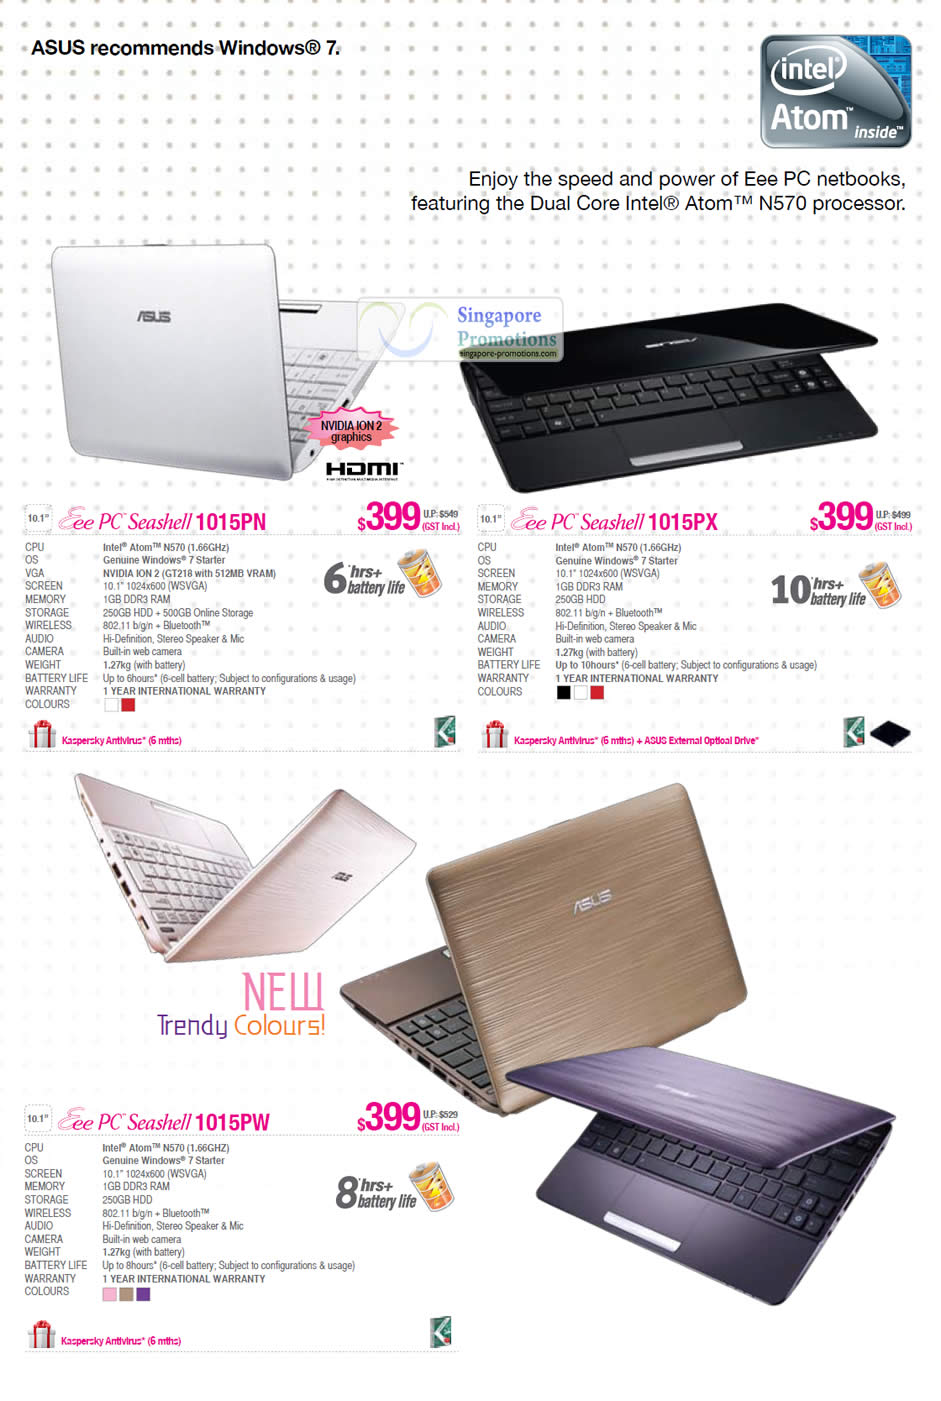 Eee PC Seashell 1015PN, Eee PC Seashell 1015PX, Eee PC Seashell 1015PW